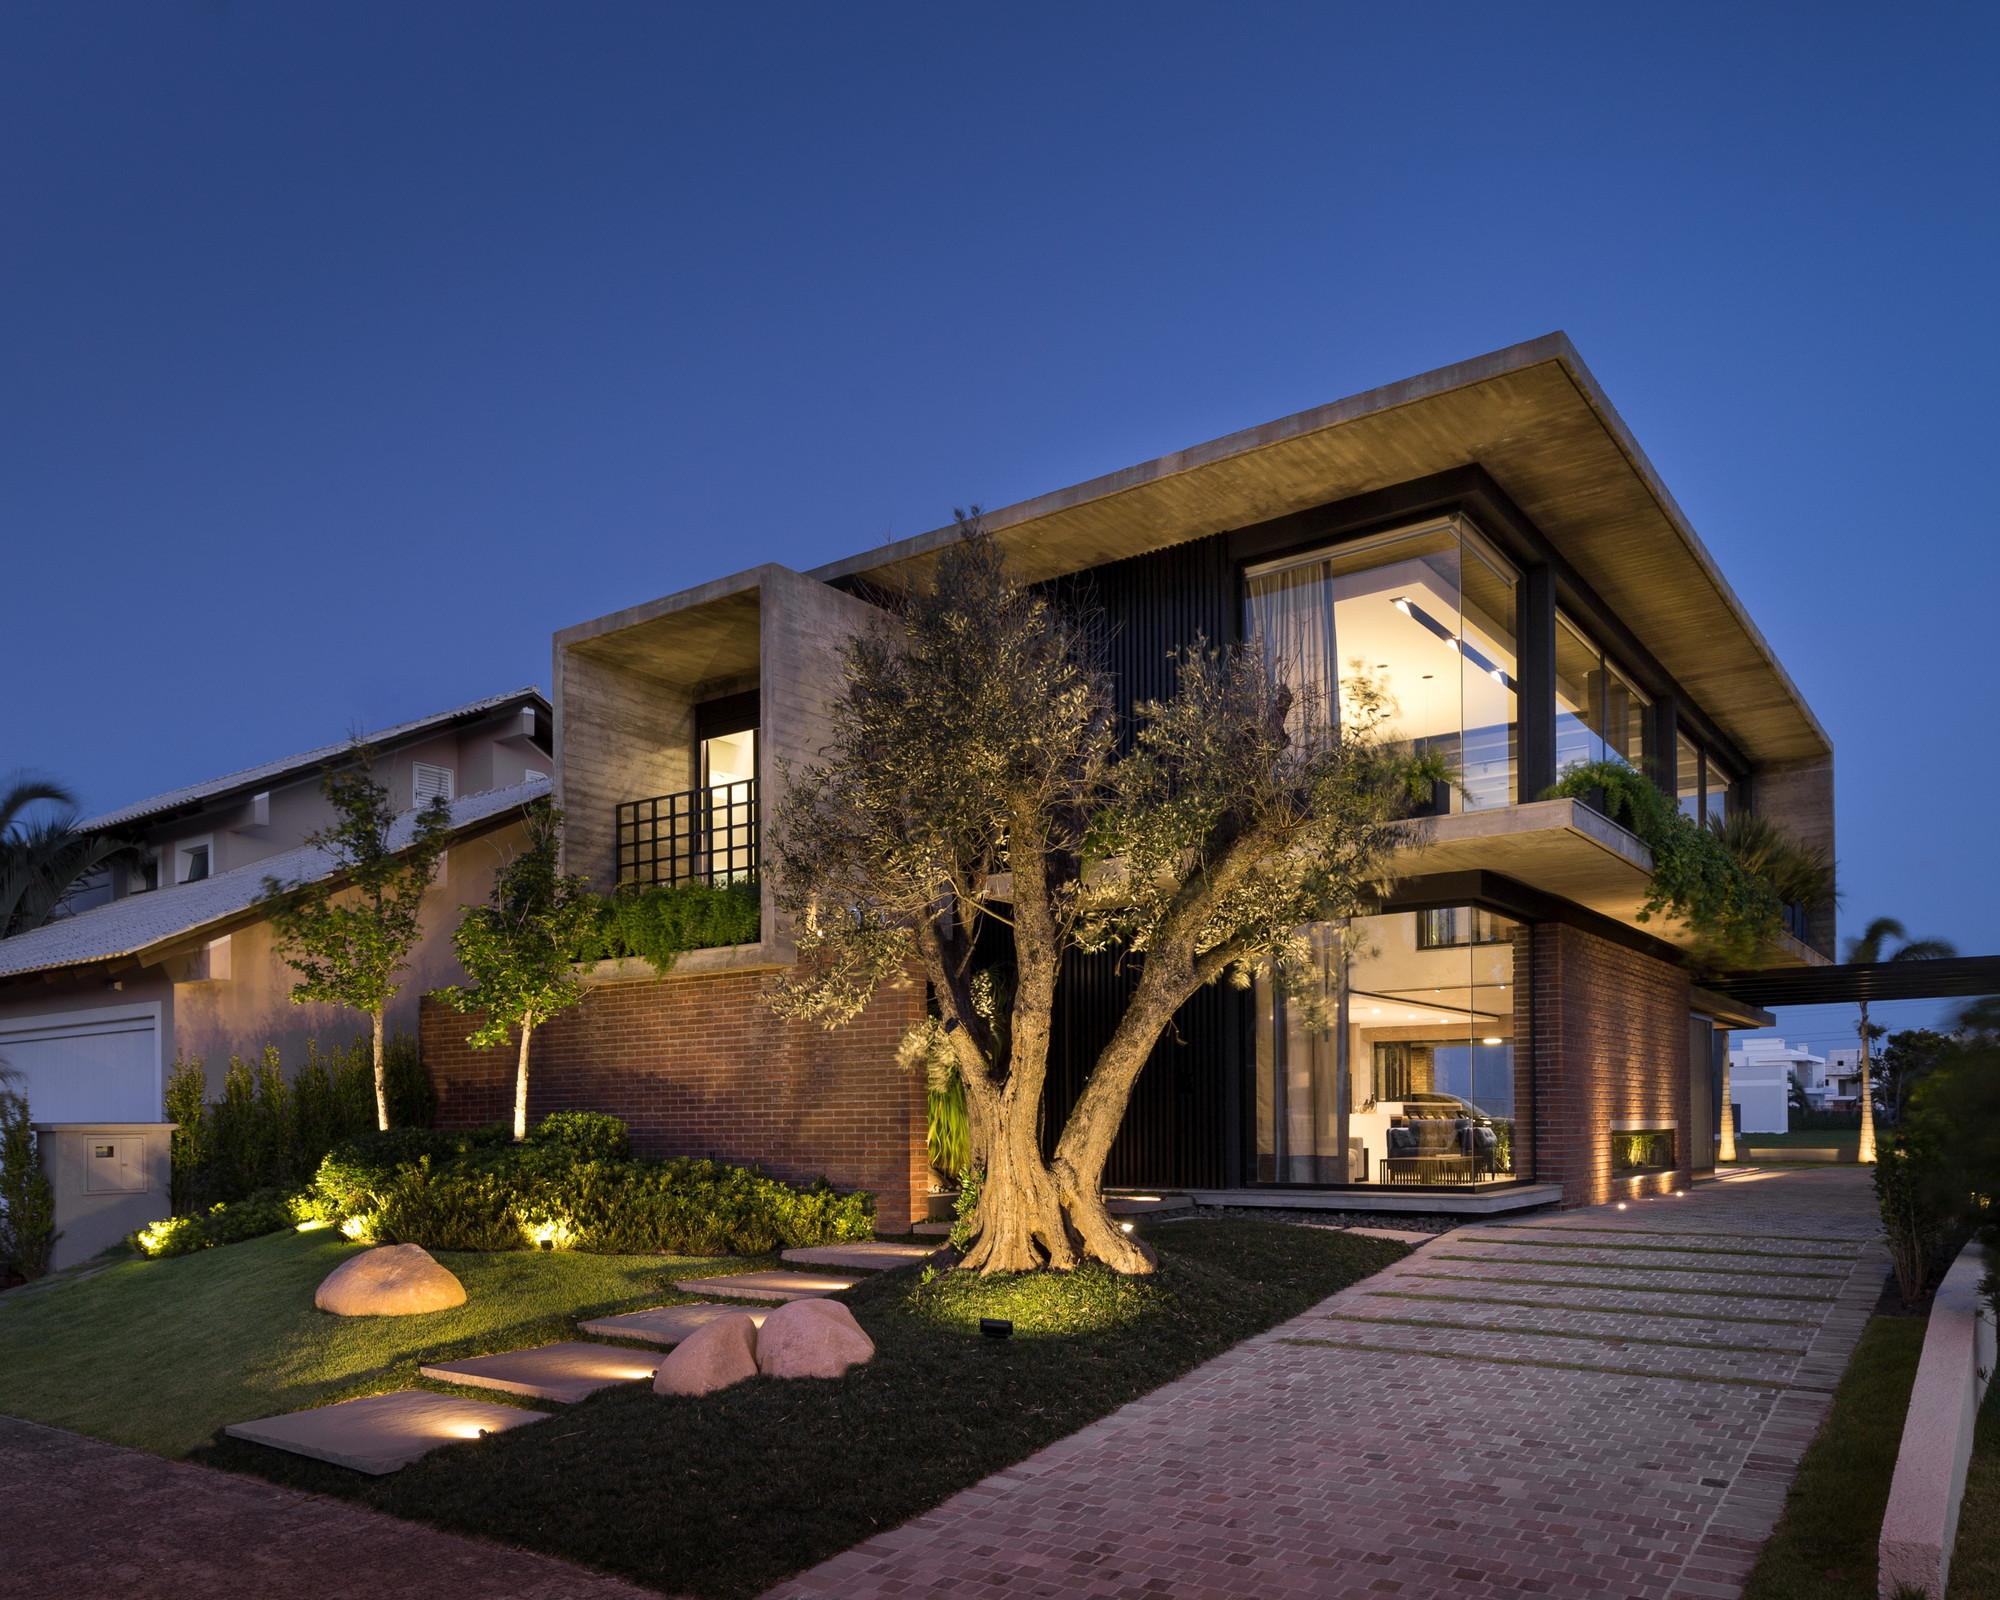 Weber House Ramella Arquitetura Archdaily